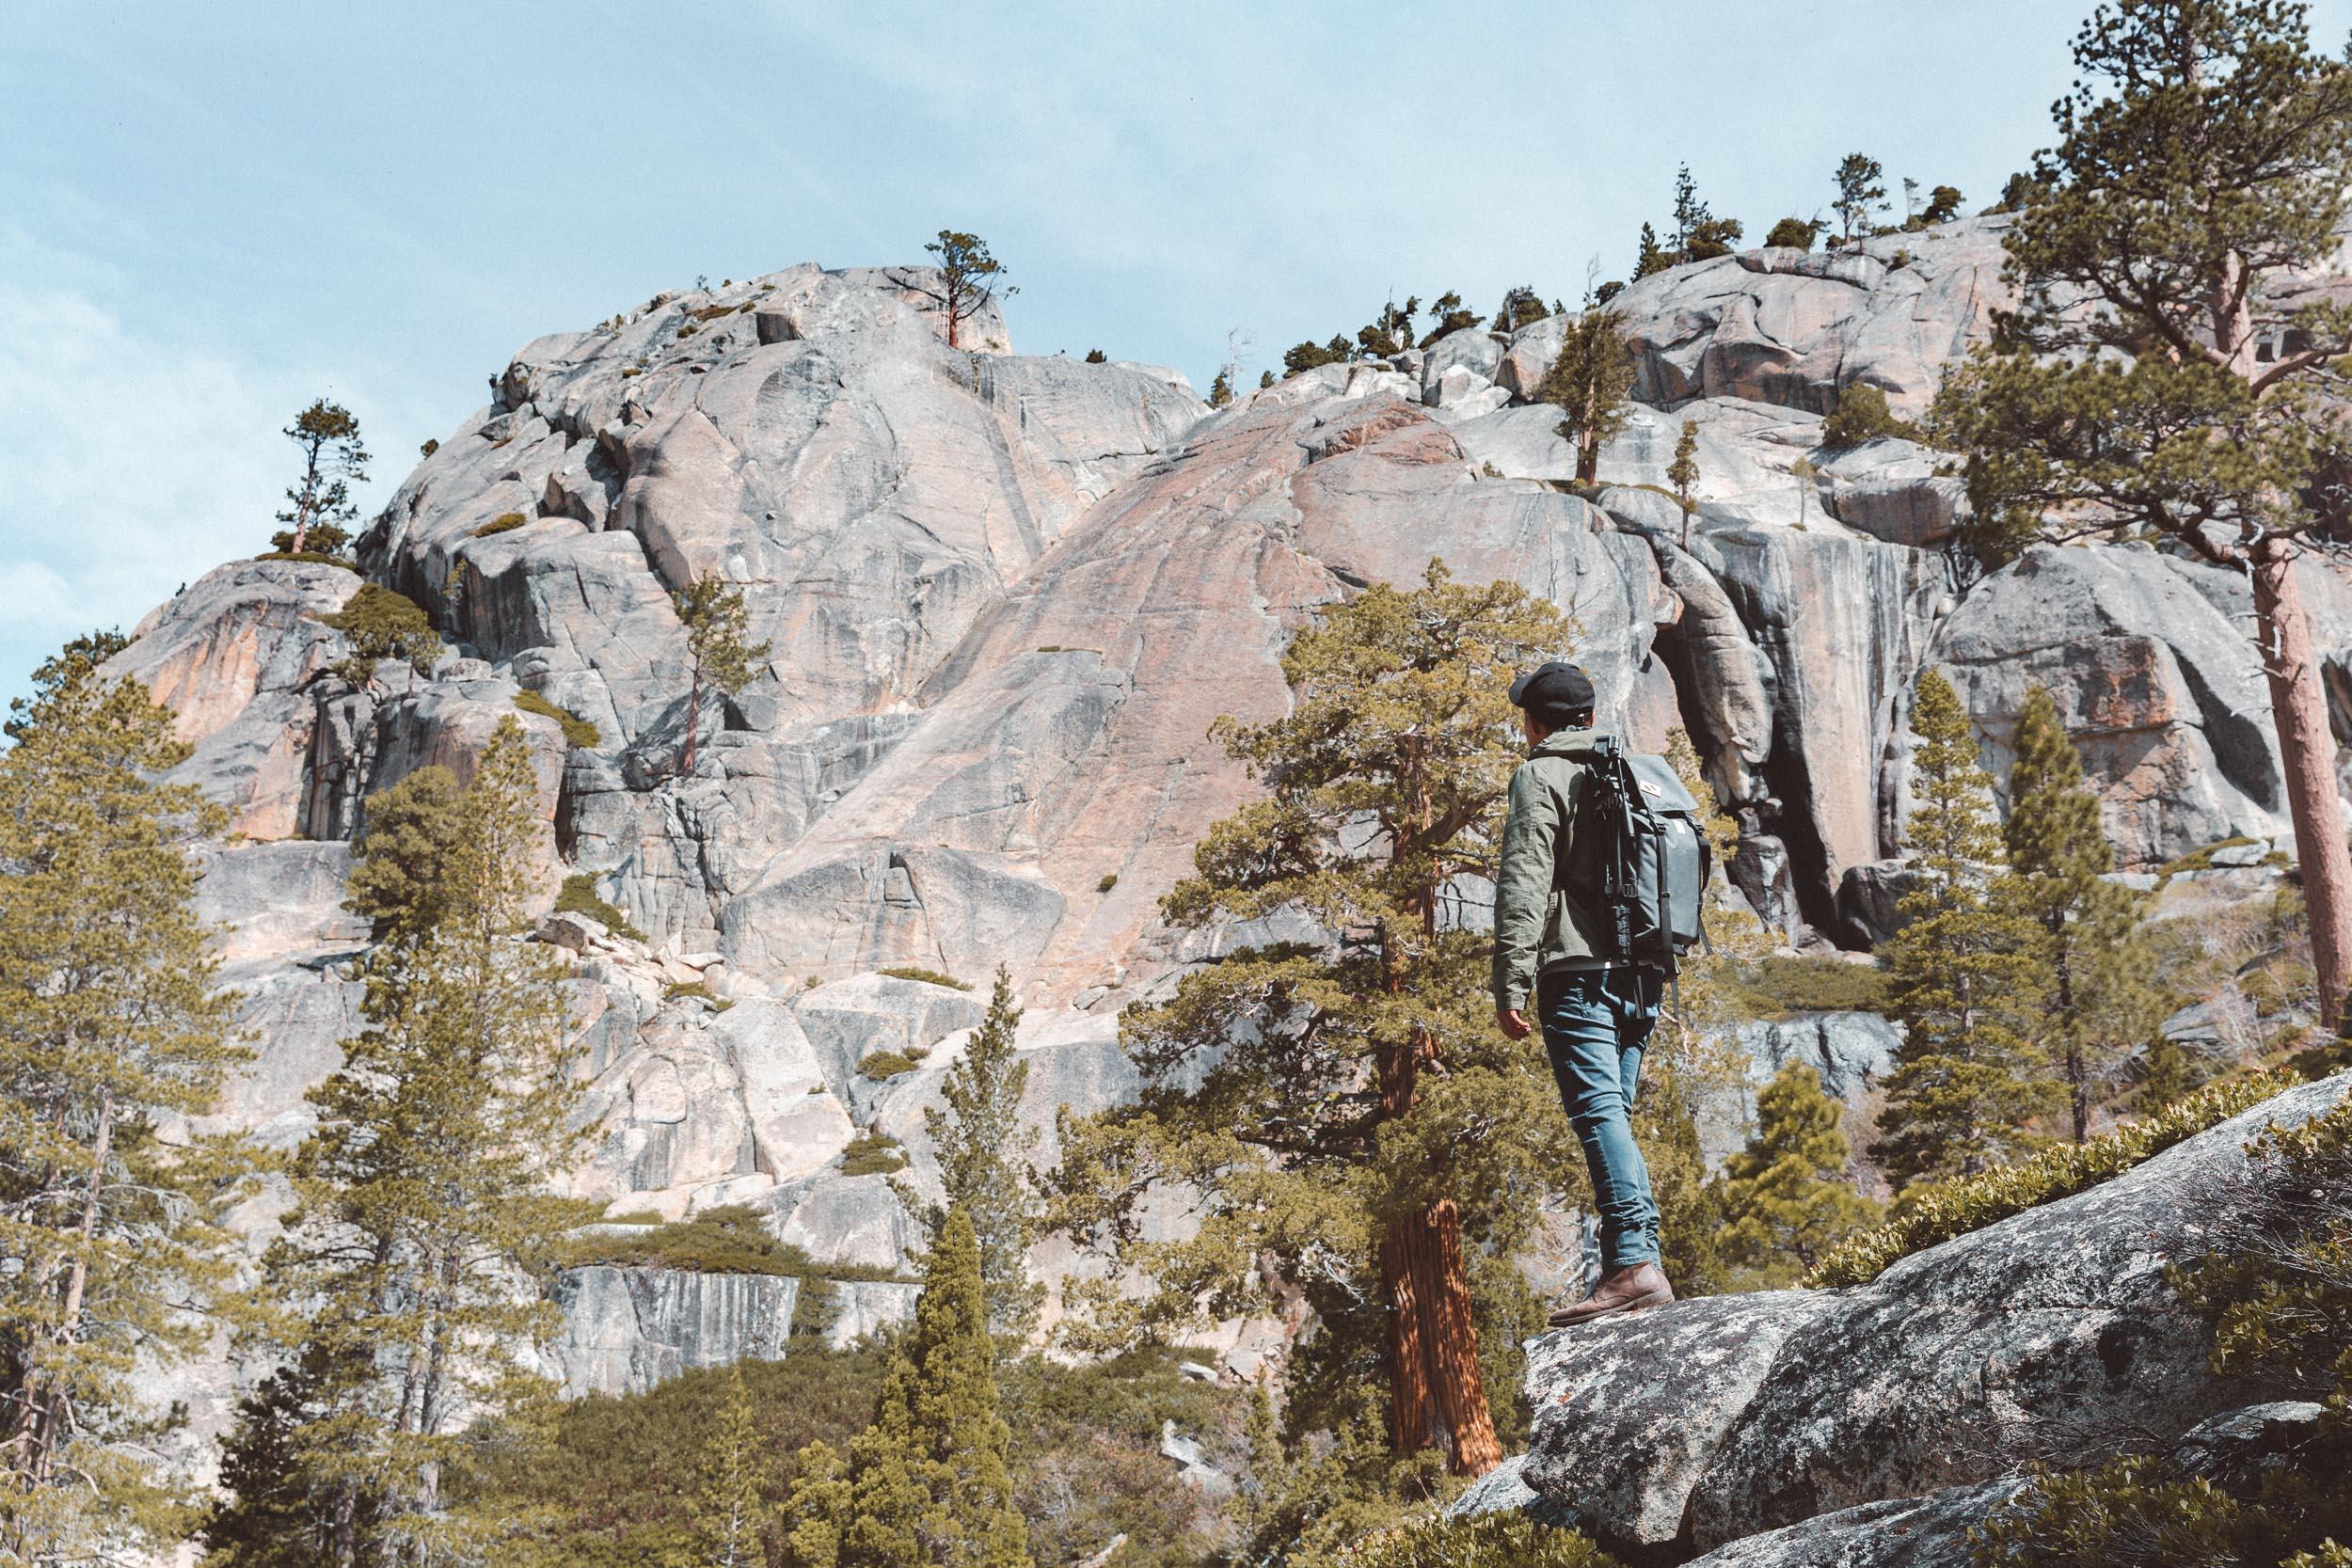 echo-lake-granite-views-hike-and-shoot-1.jpg